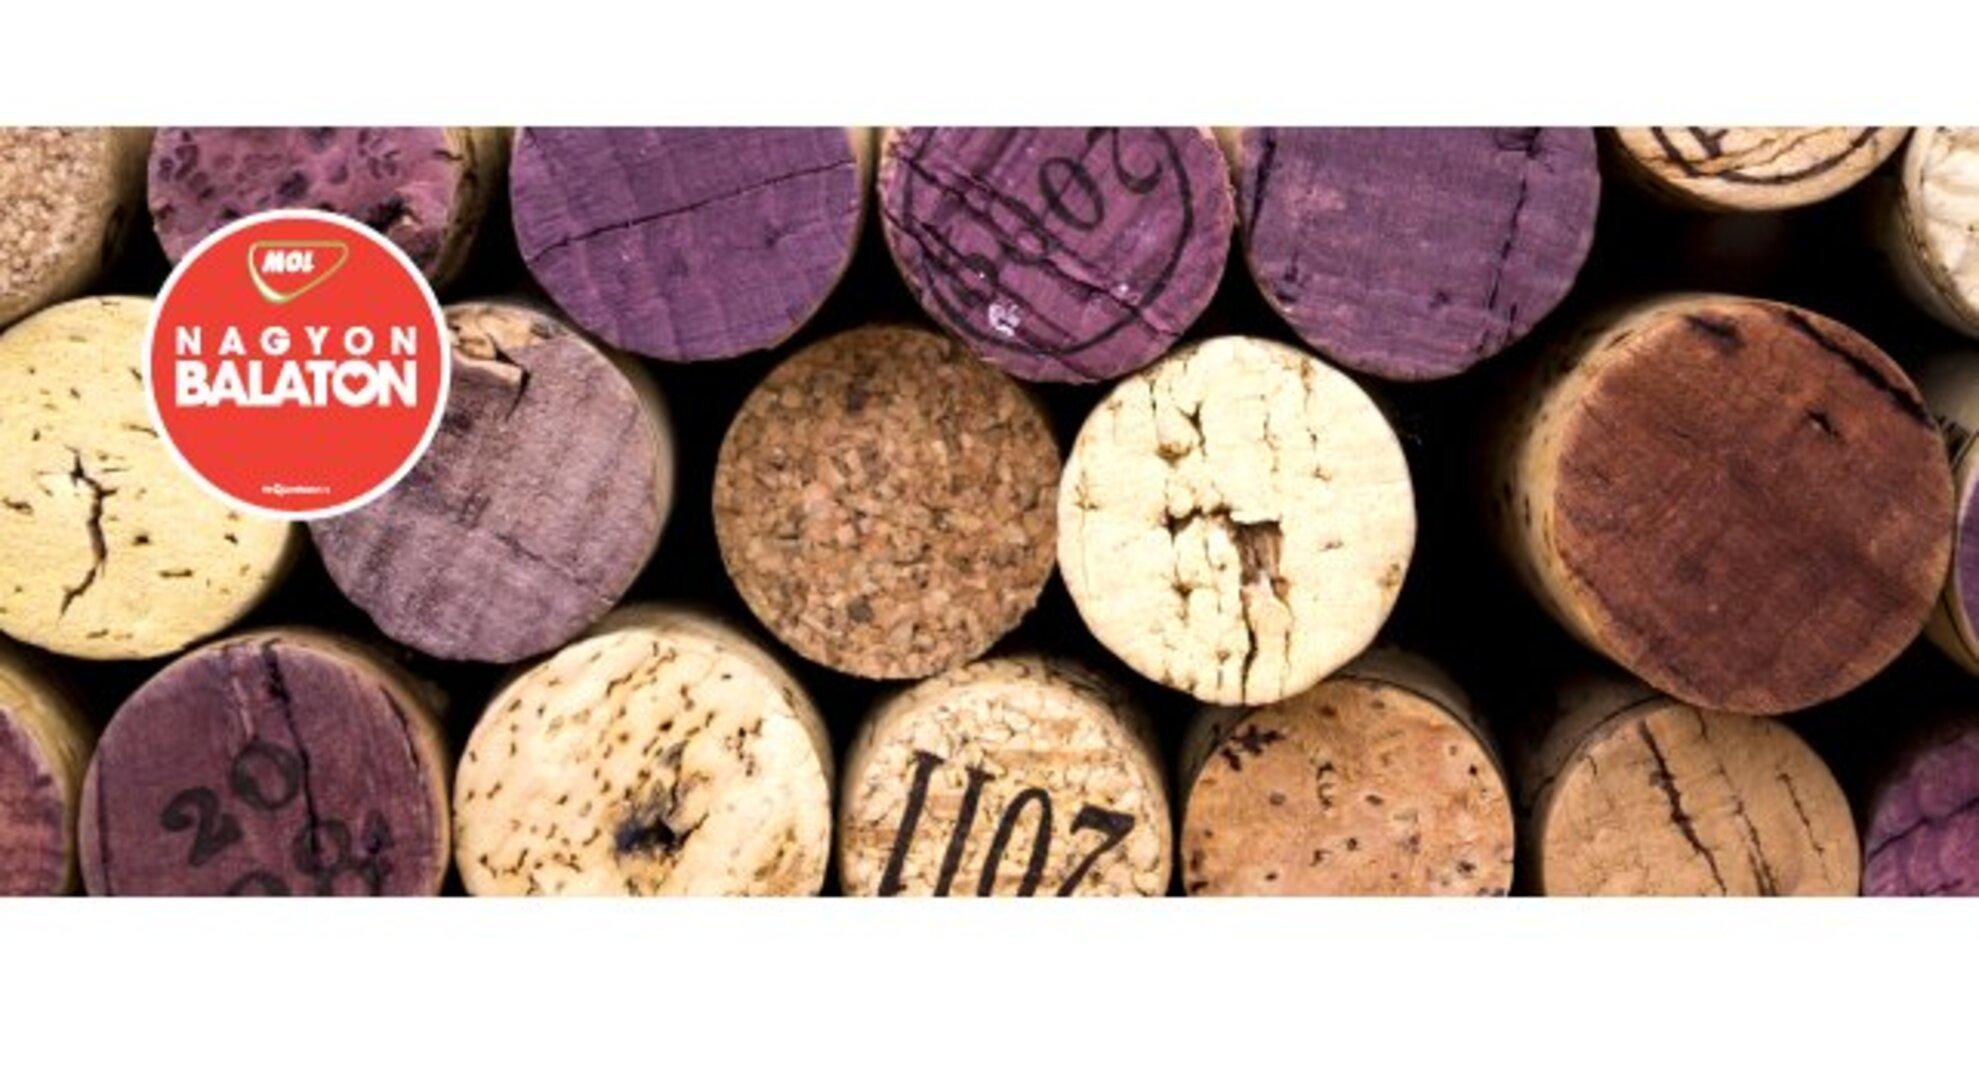 Balatonfüred Wine Weeks